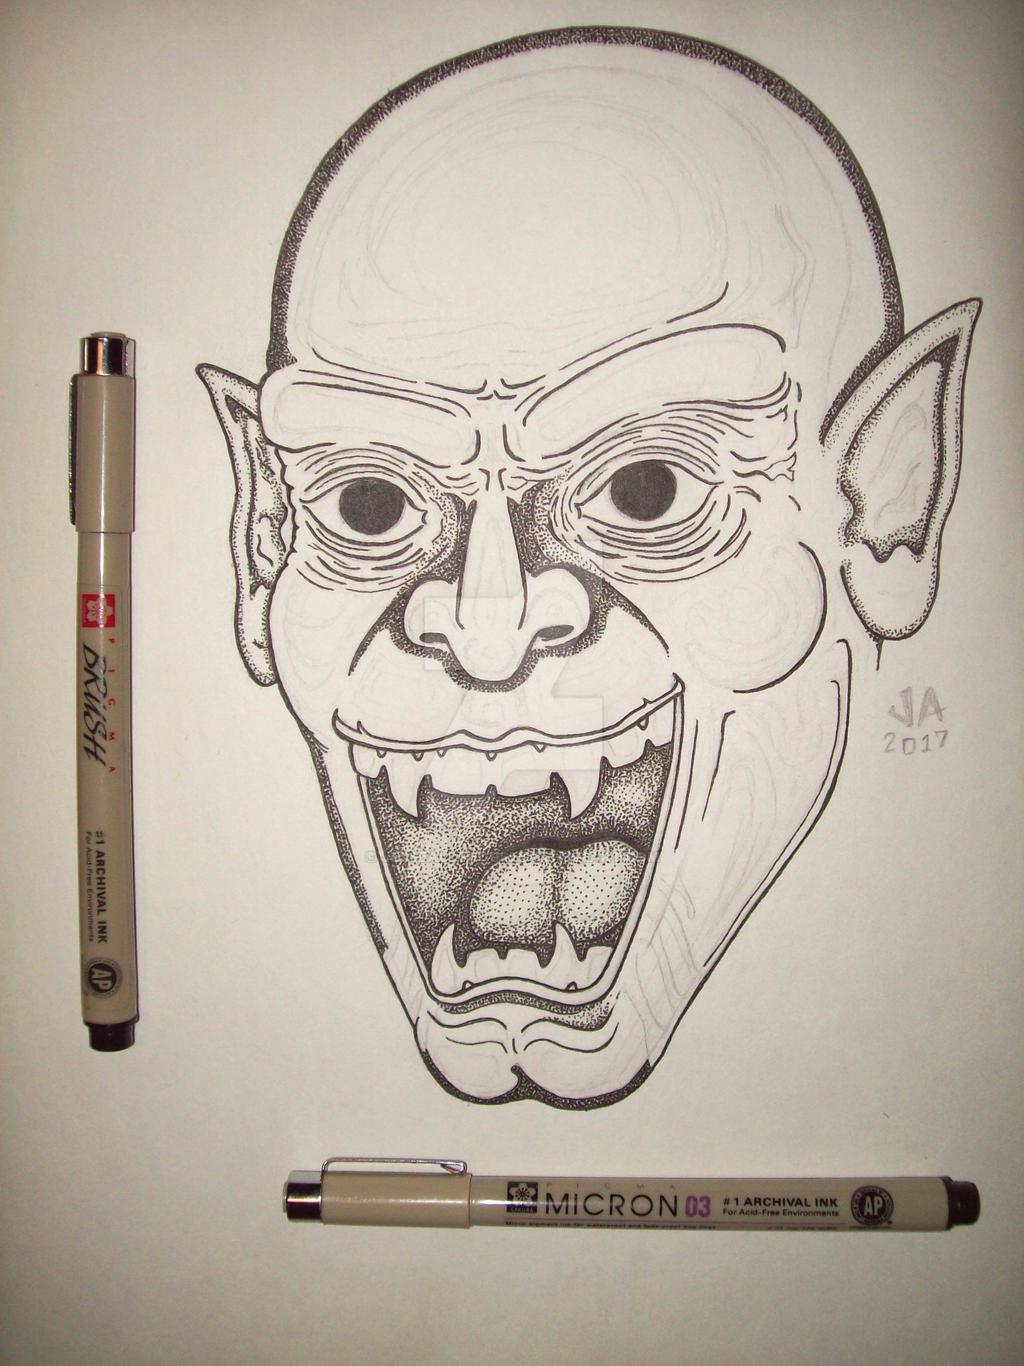 Nosferatu Pen and Ink Work In Progress